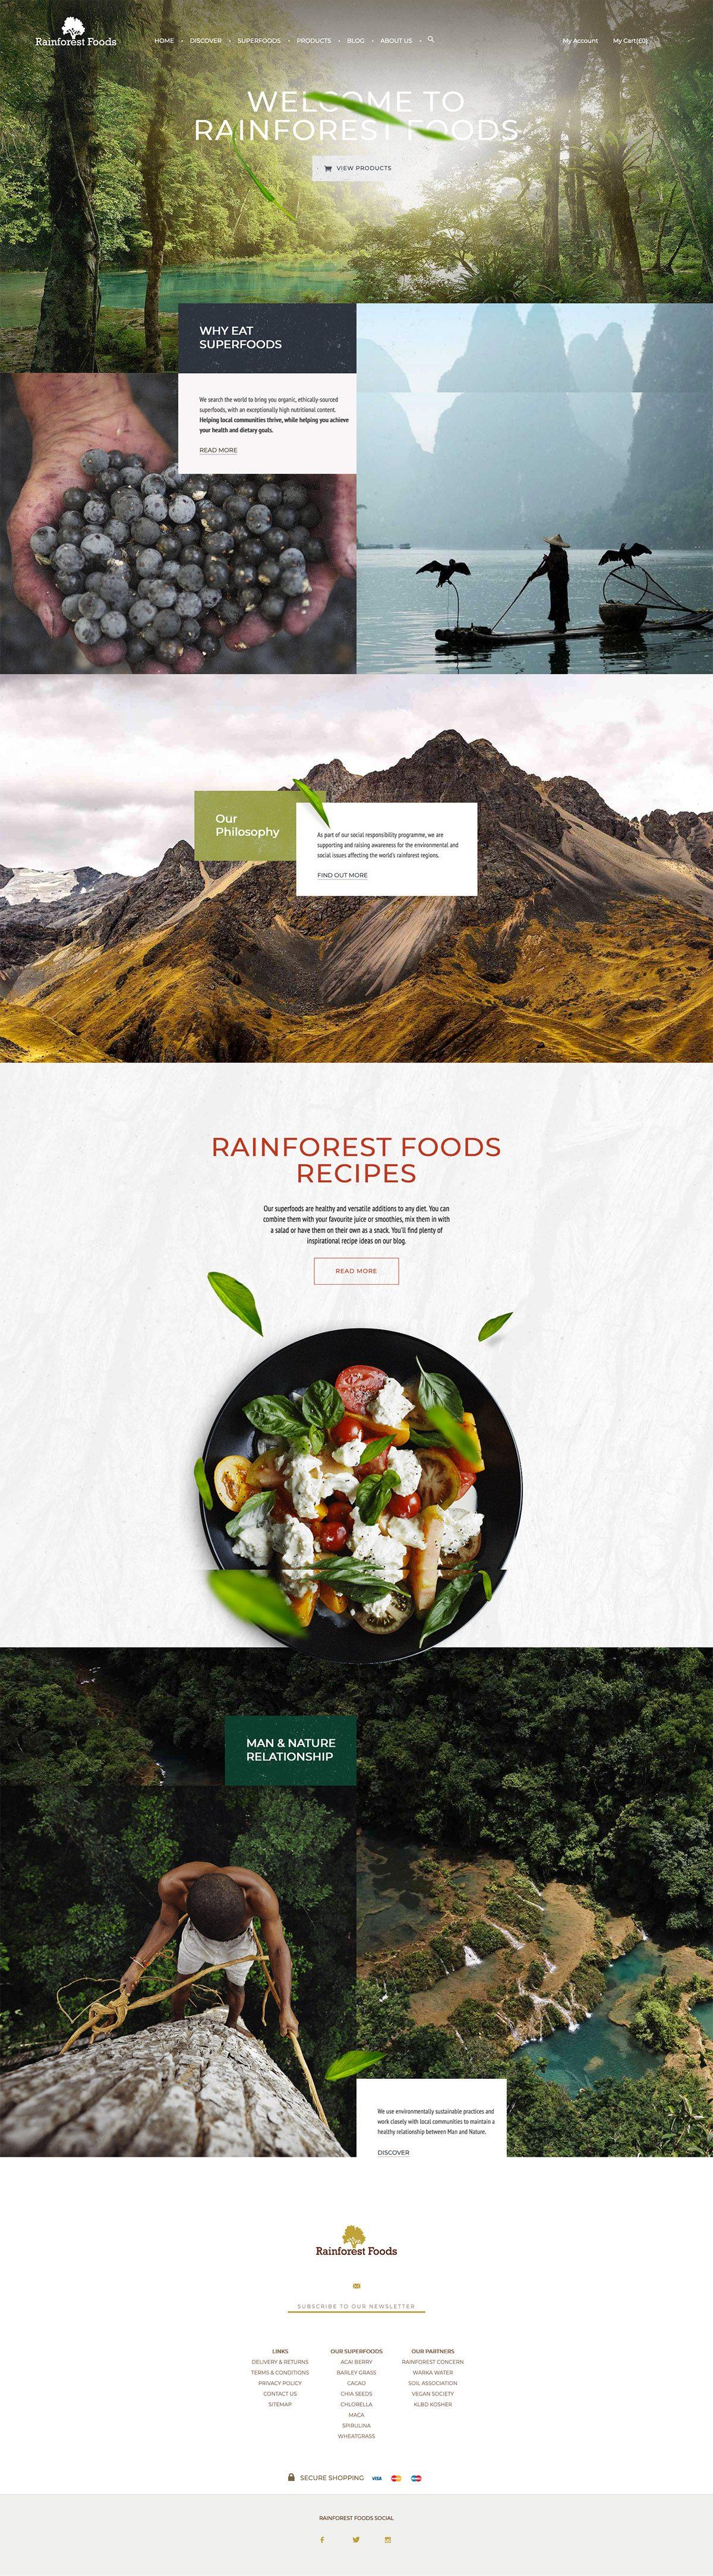 eCommerce website: Rainforest Foods